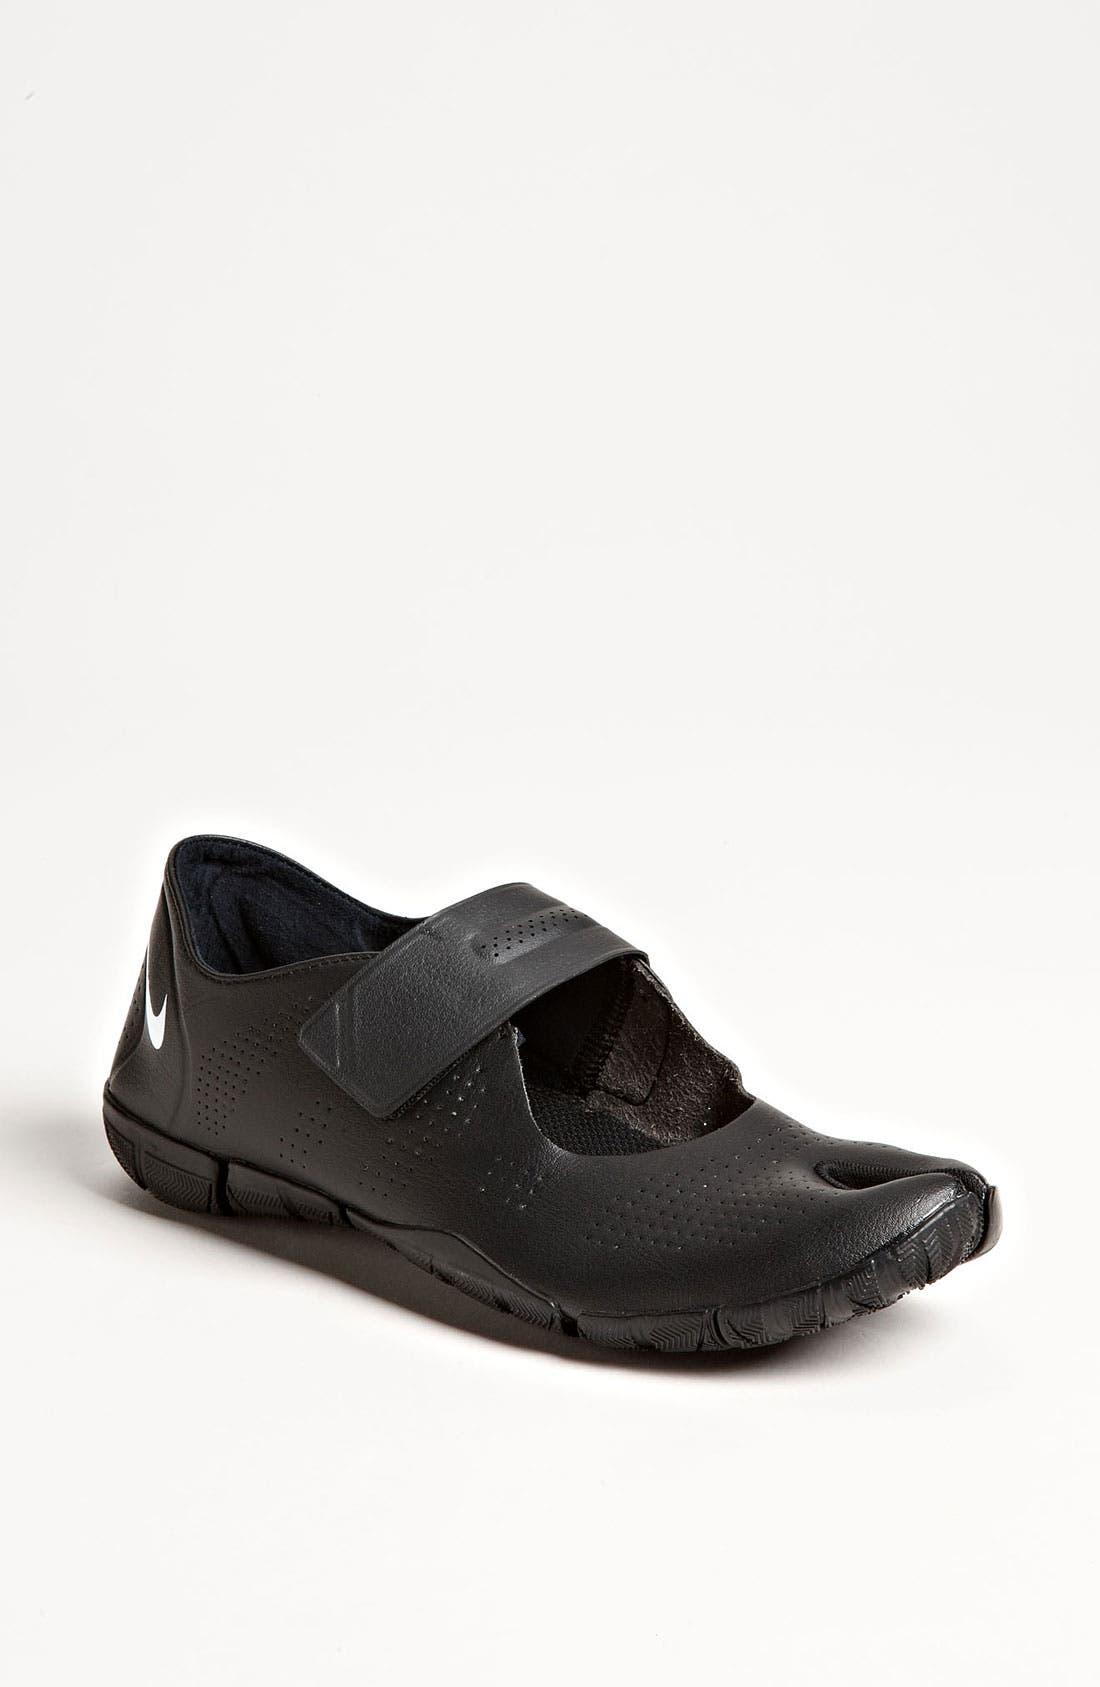 Main Image - Nike 'Free Gym' Training Shoe (Women)